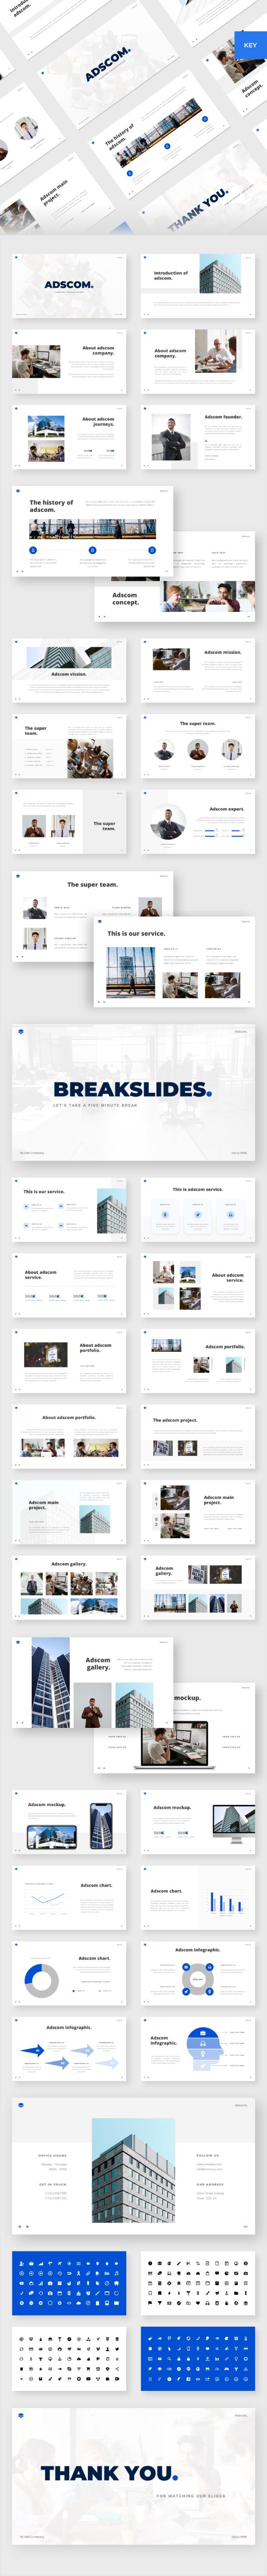 Adscom - Business Keynote Template